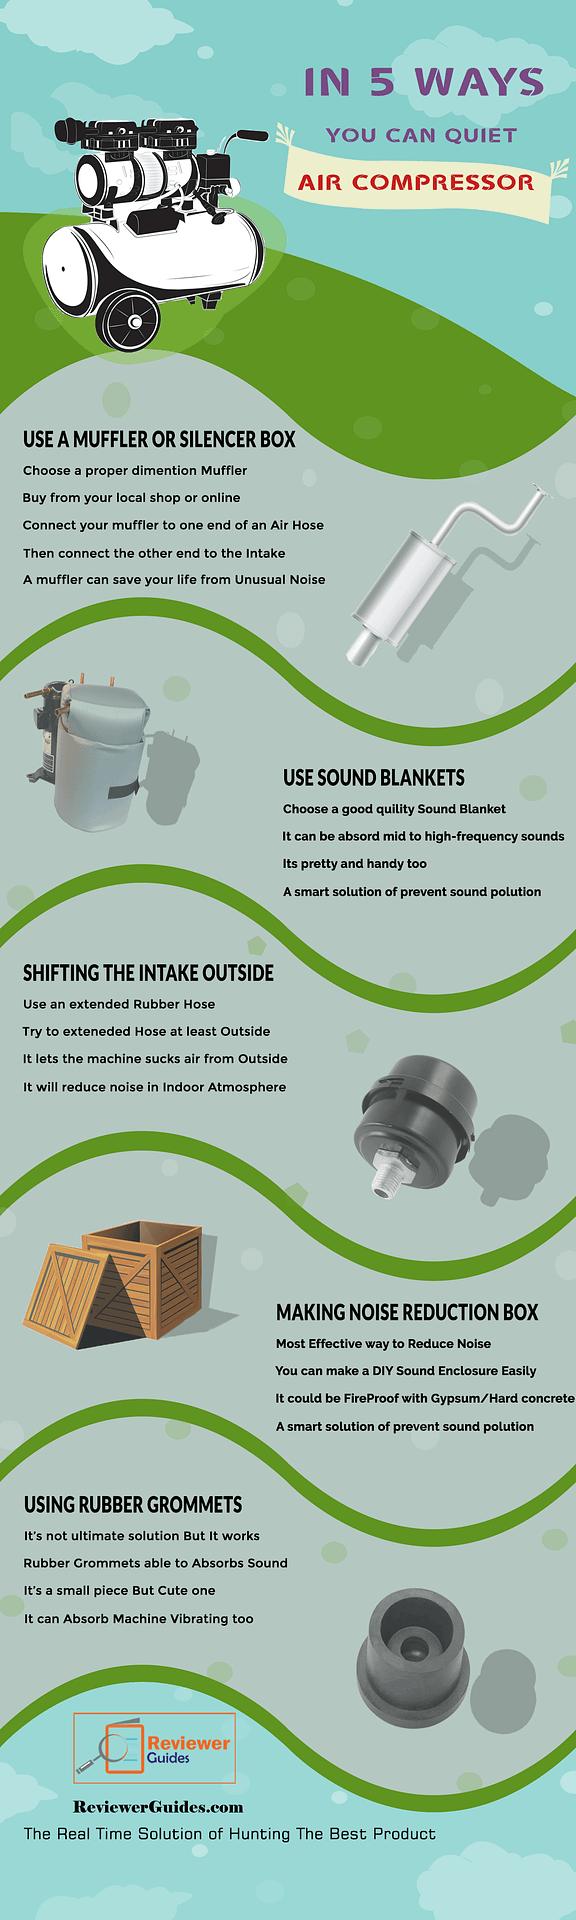 Quiet Air Compressor Infographic